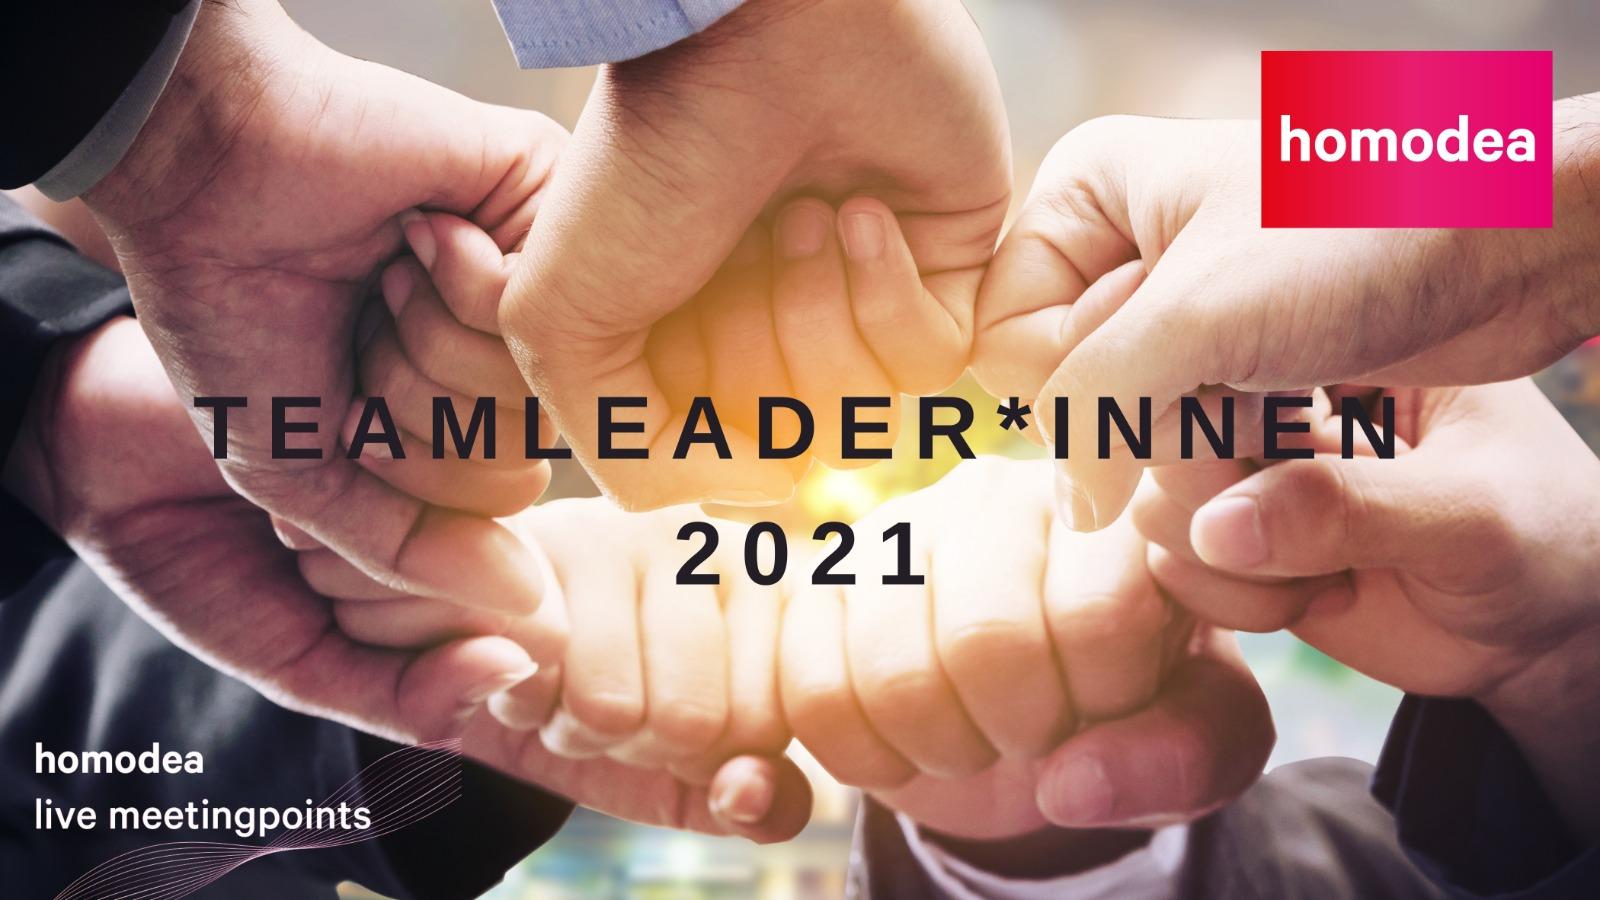 teamleader_zoom_call